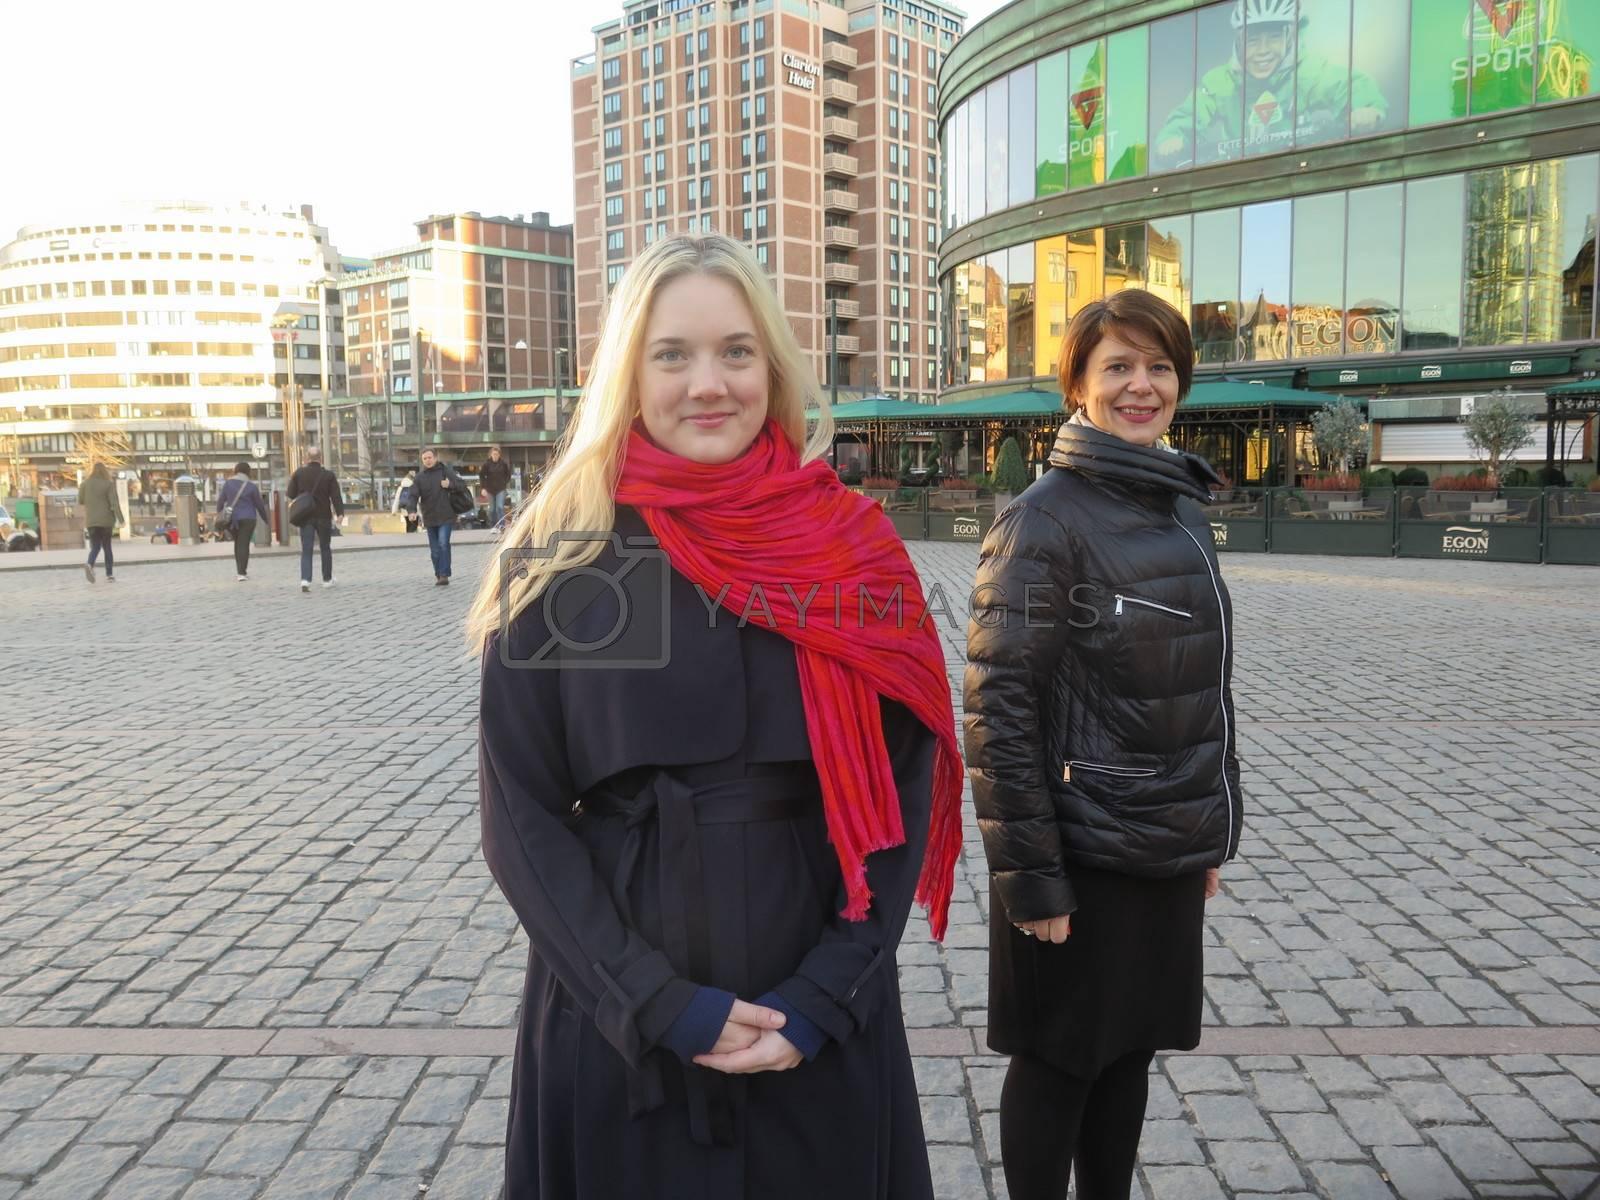 Aina Stenersen (Frp) og Tone Tellevik Dahl (Ap) by camilla.svendsen@nettavisen.no